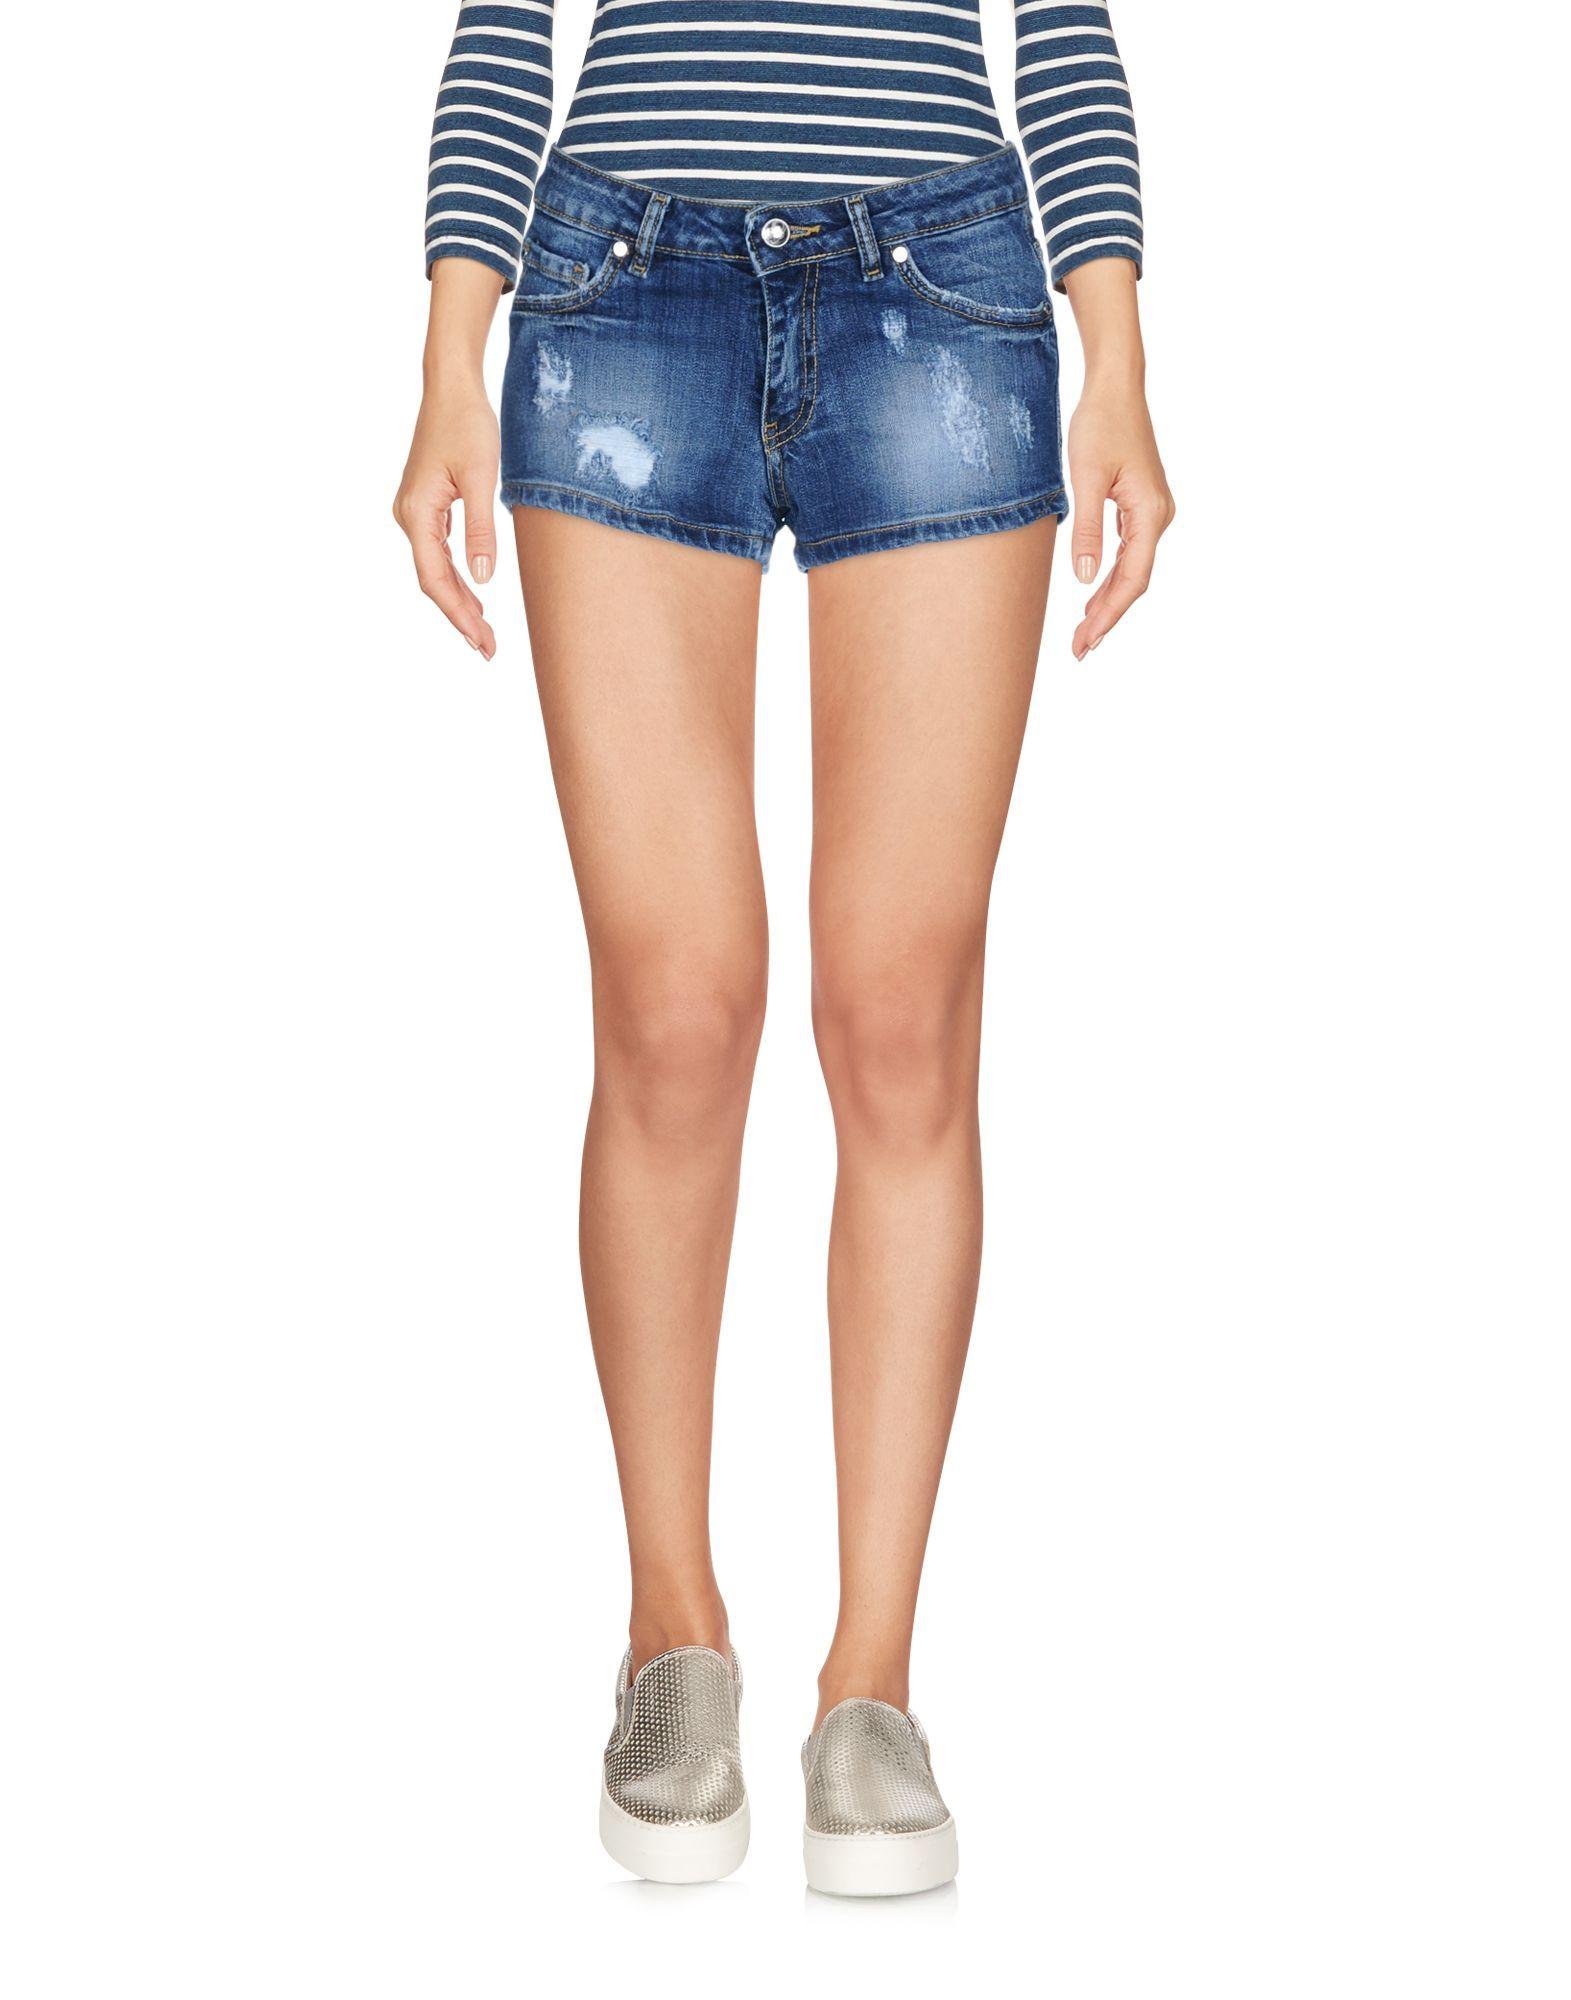 Frankie Morello Blue Denim Shorts